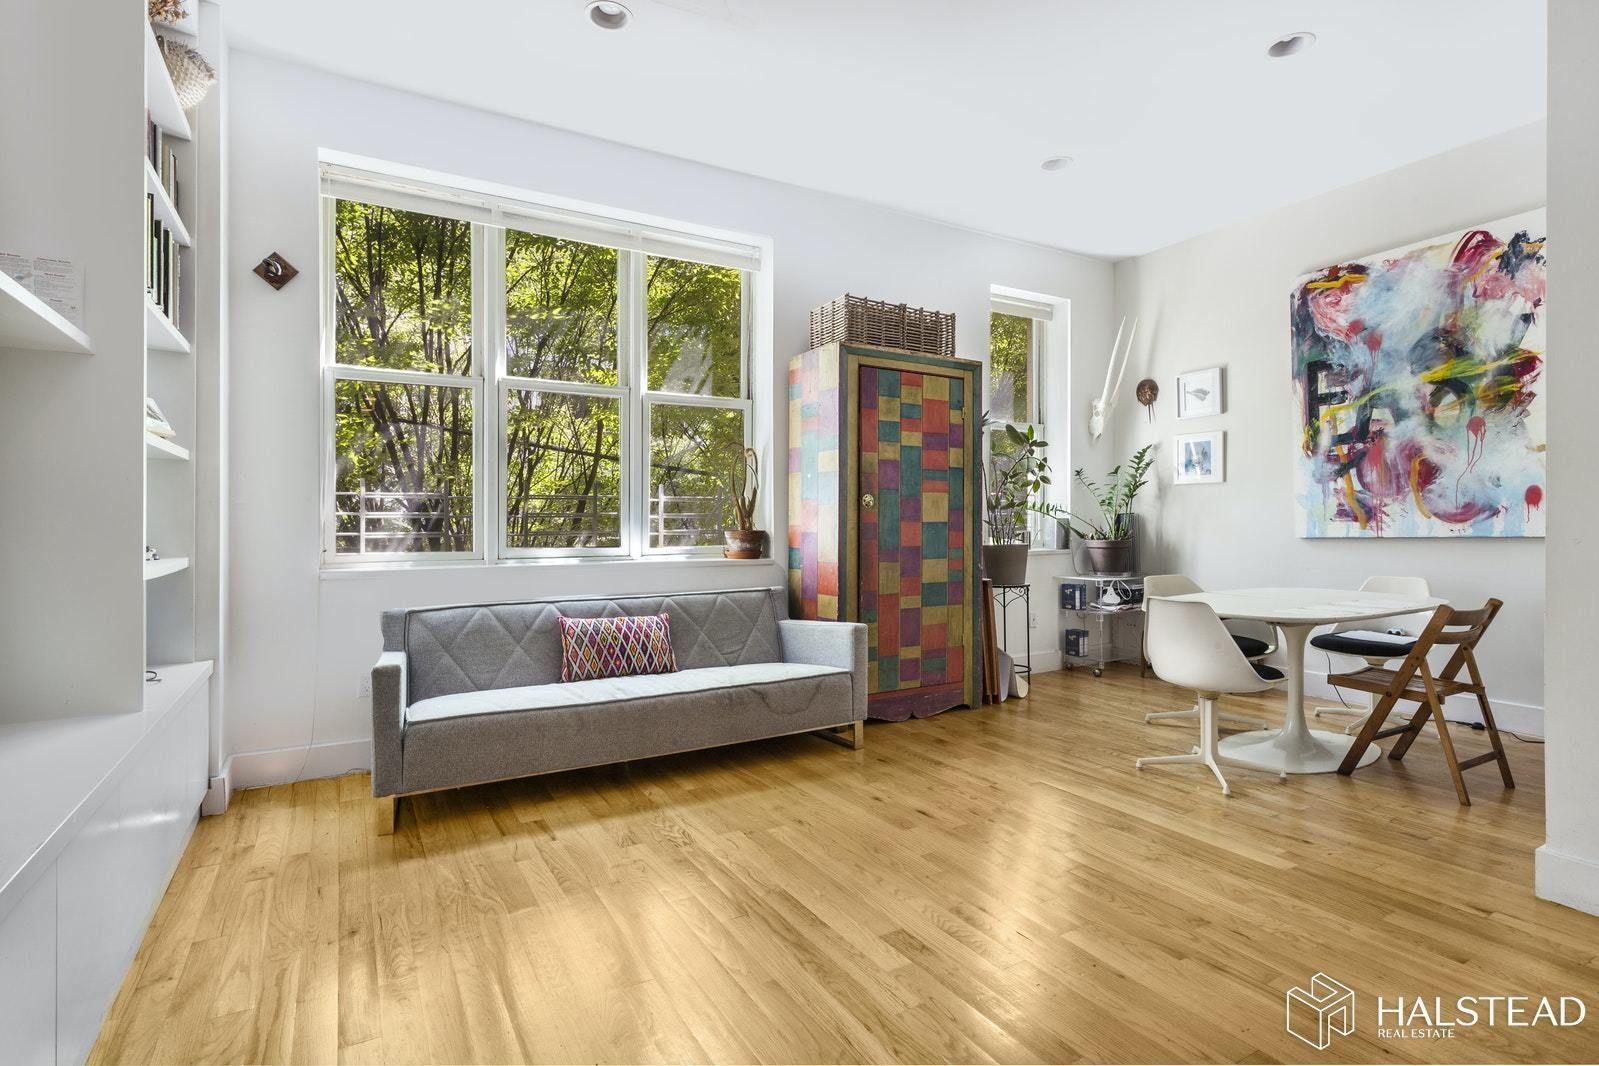 Apartment for sale at 63 Engert Avenue, Apt 2